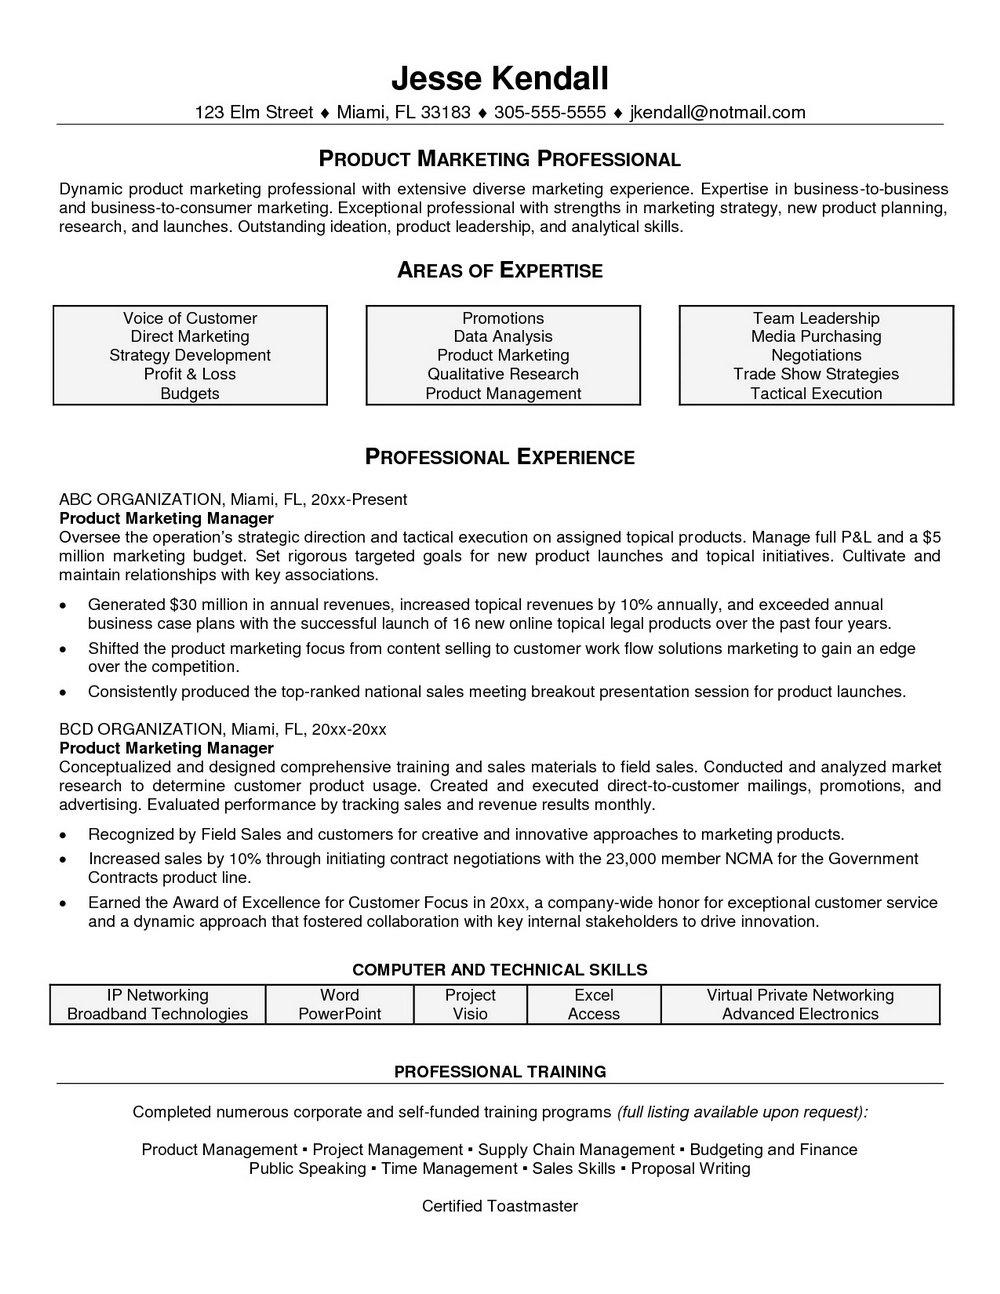 Resume Samples For Marketing Professionals